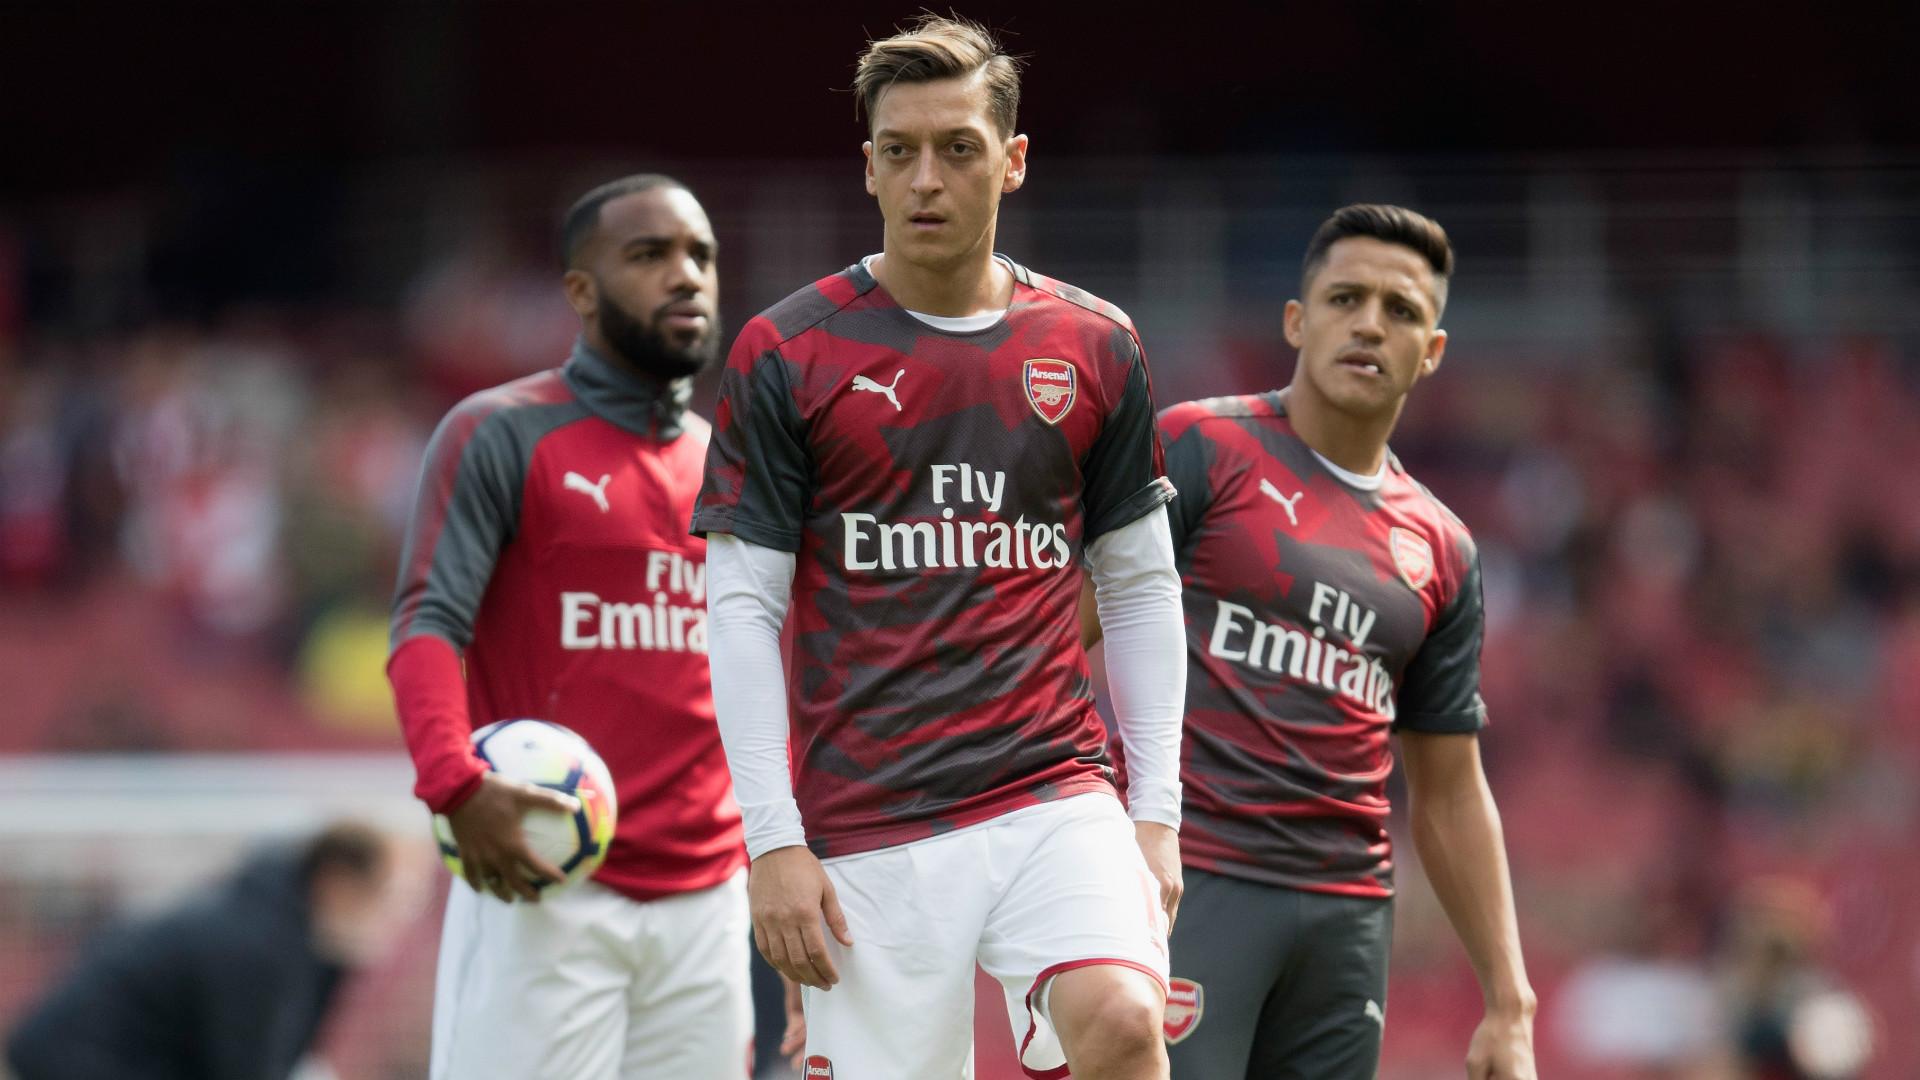 Manchester United glaubt an Özil-Transfer im Sommer 2018